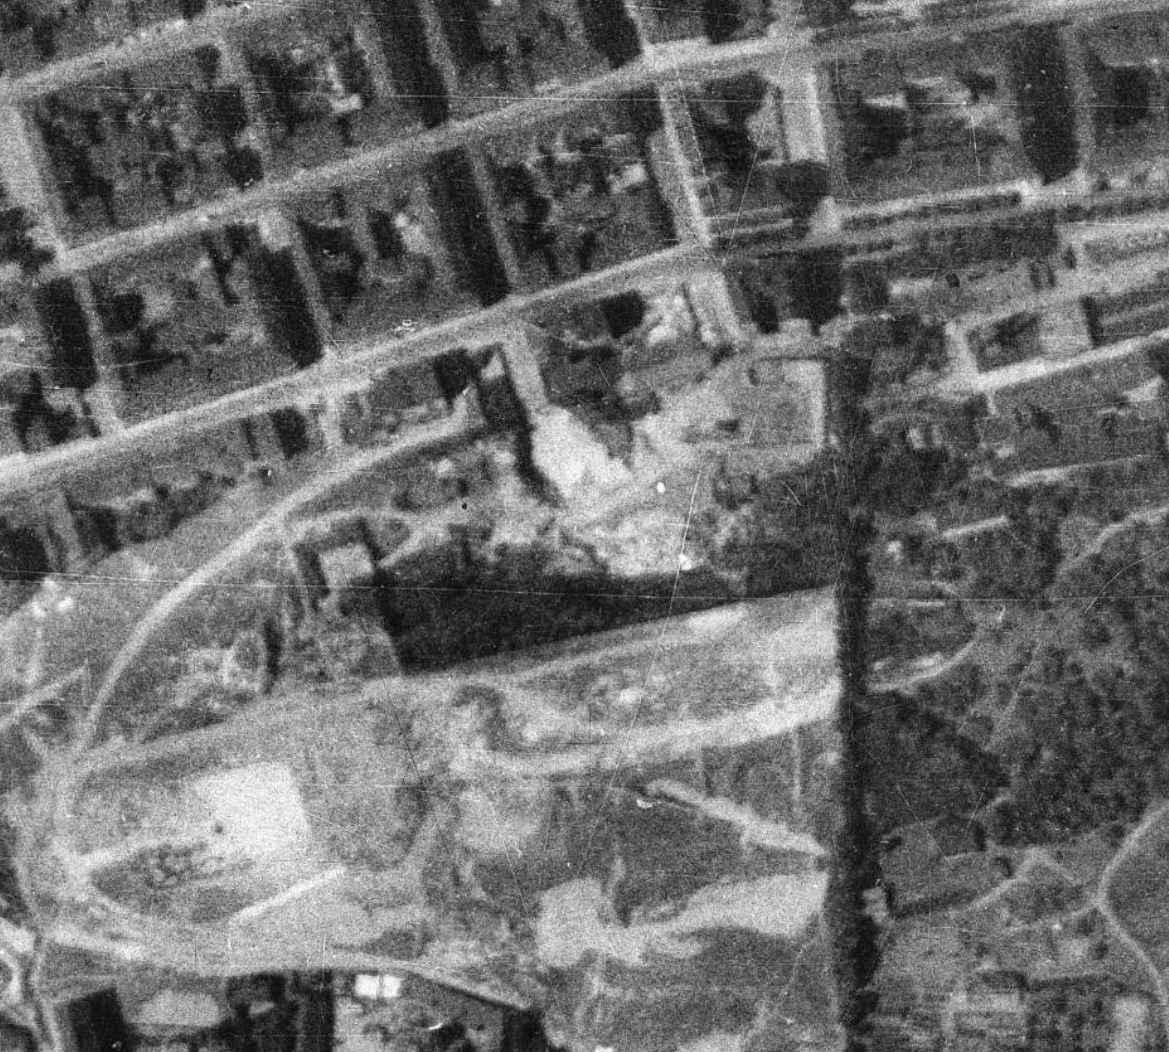 nouzova-kolonie-u-kapslovny-letecky-snimek-1938